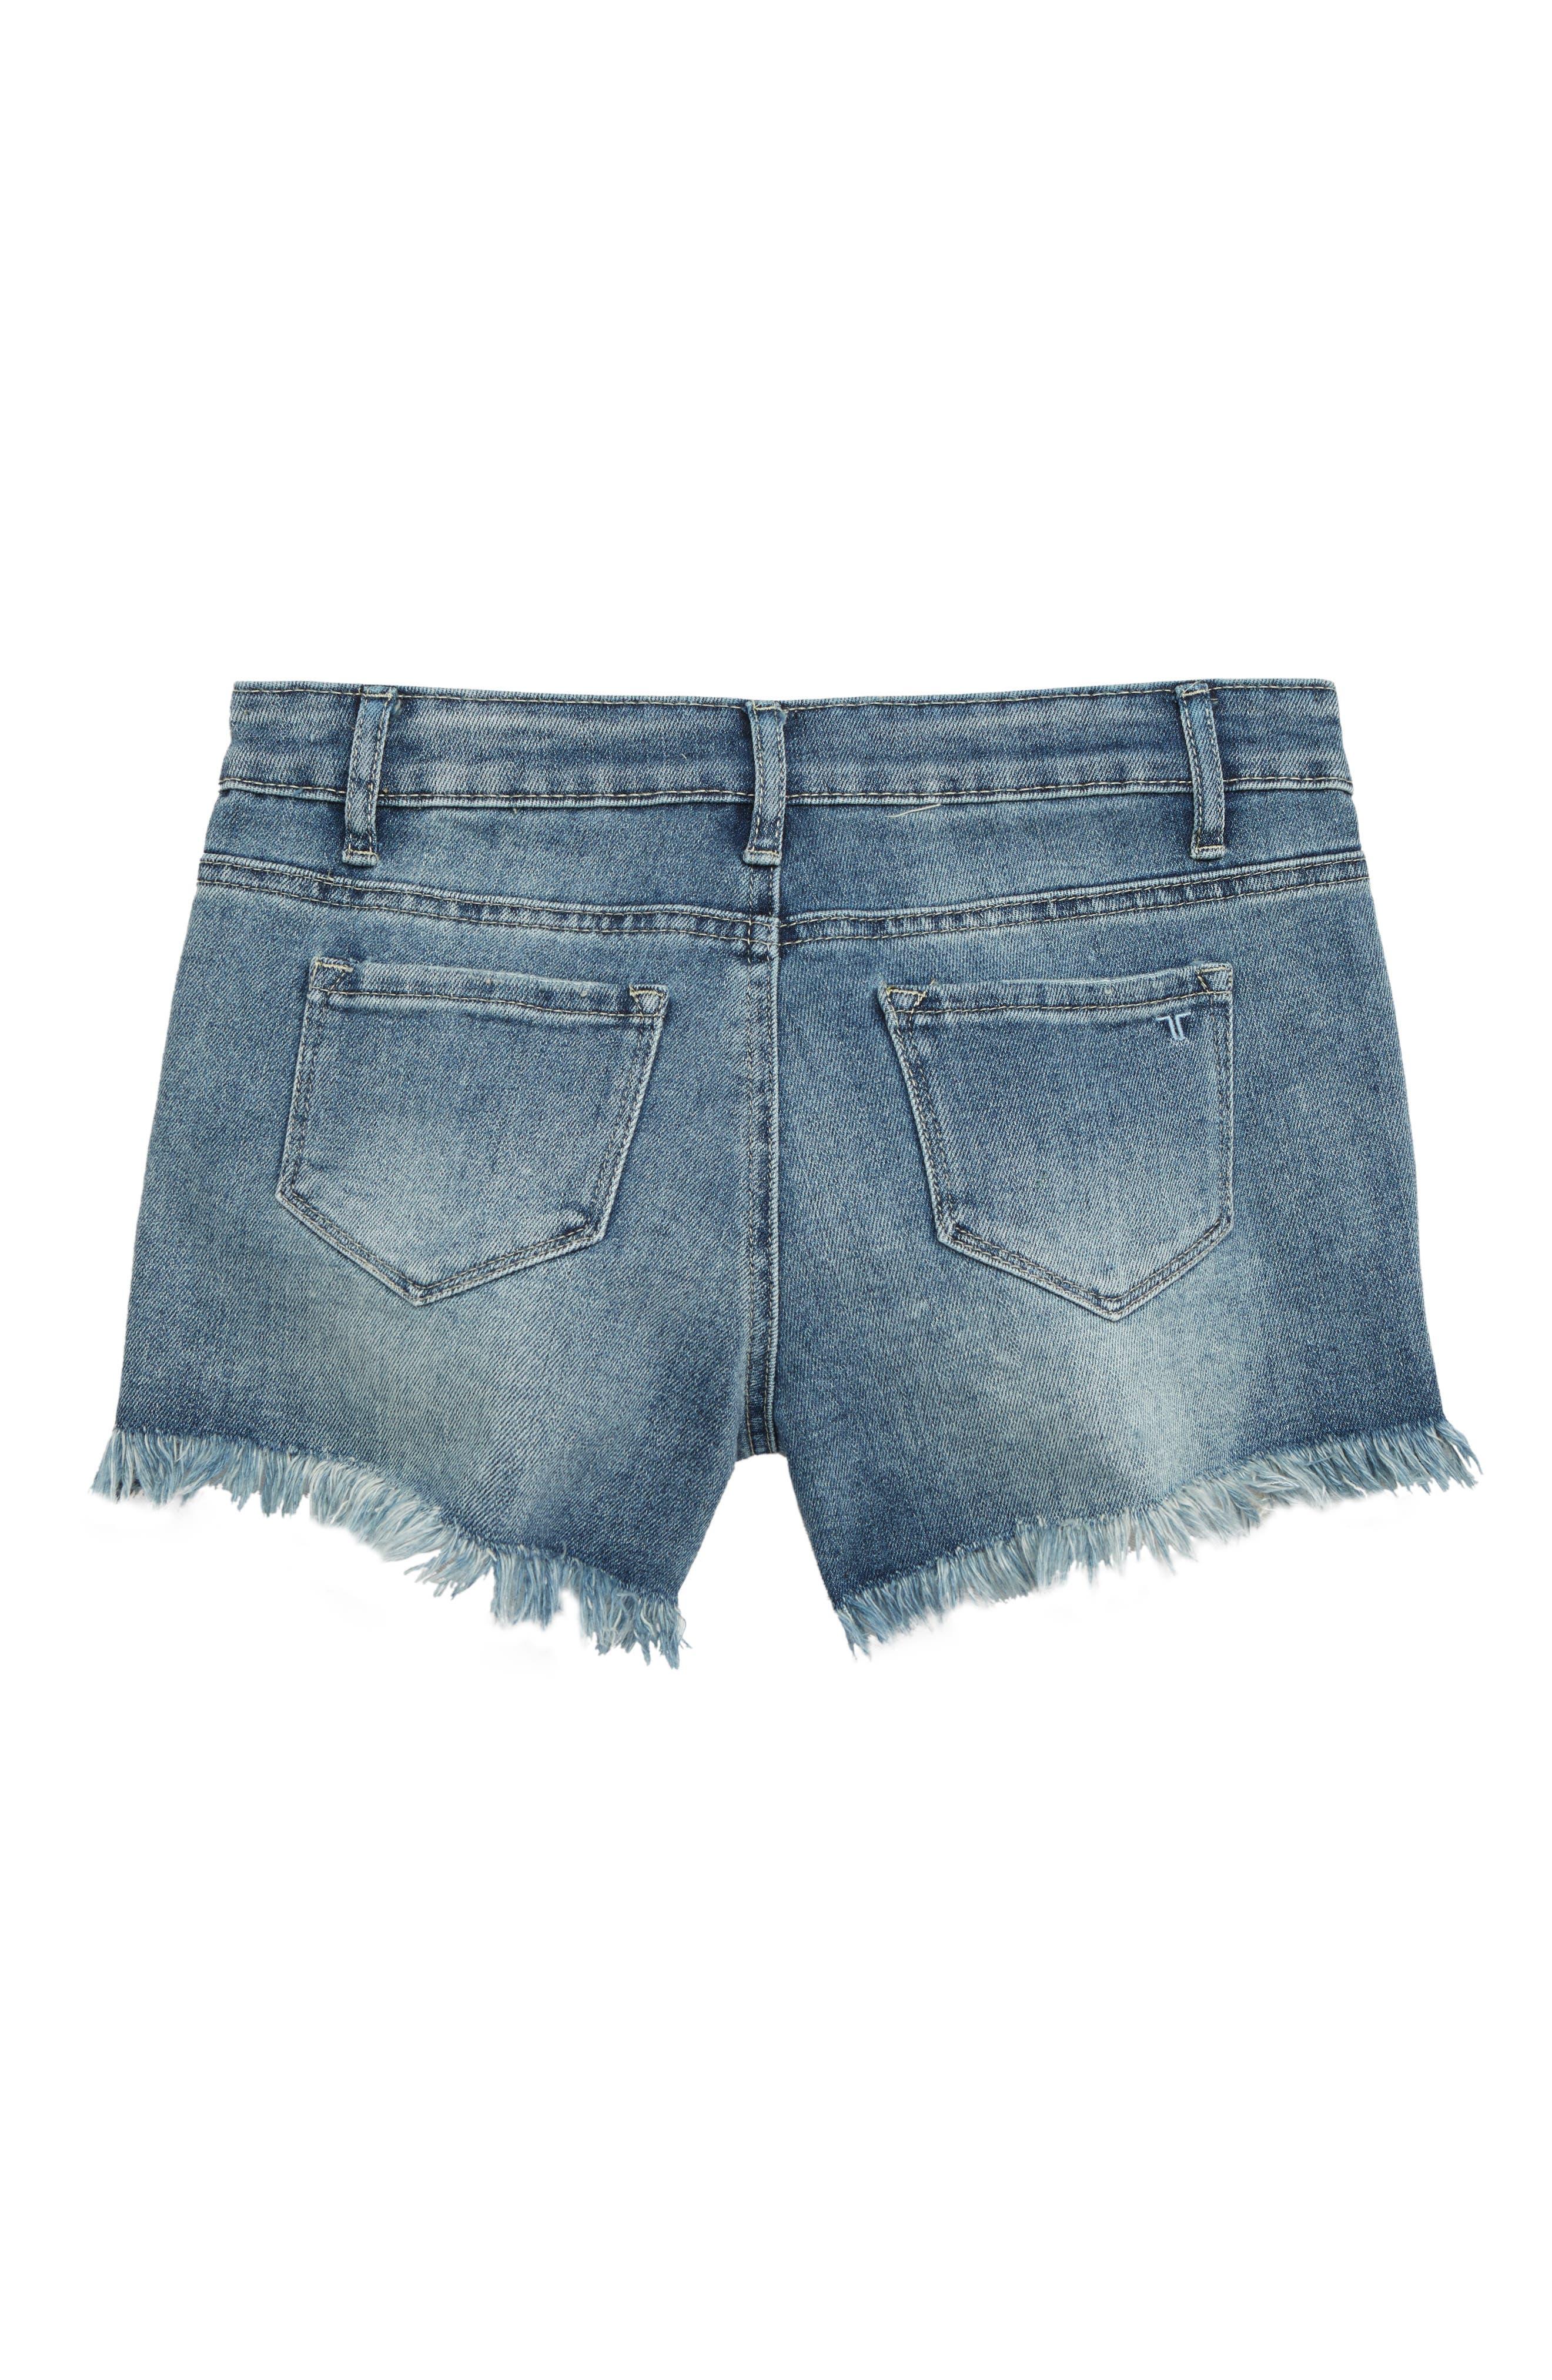 TRACTR,                             Cutoff Denim Shorts,                             Alternate thumbnail 2, color,                             INDIGO